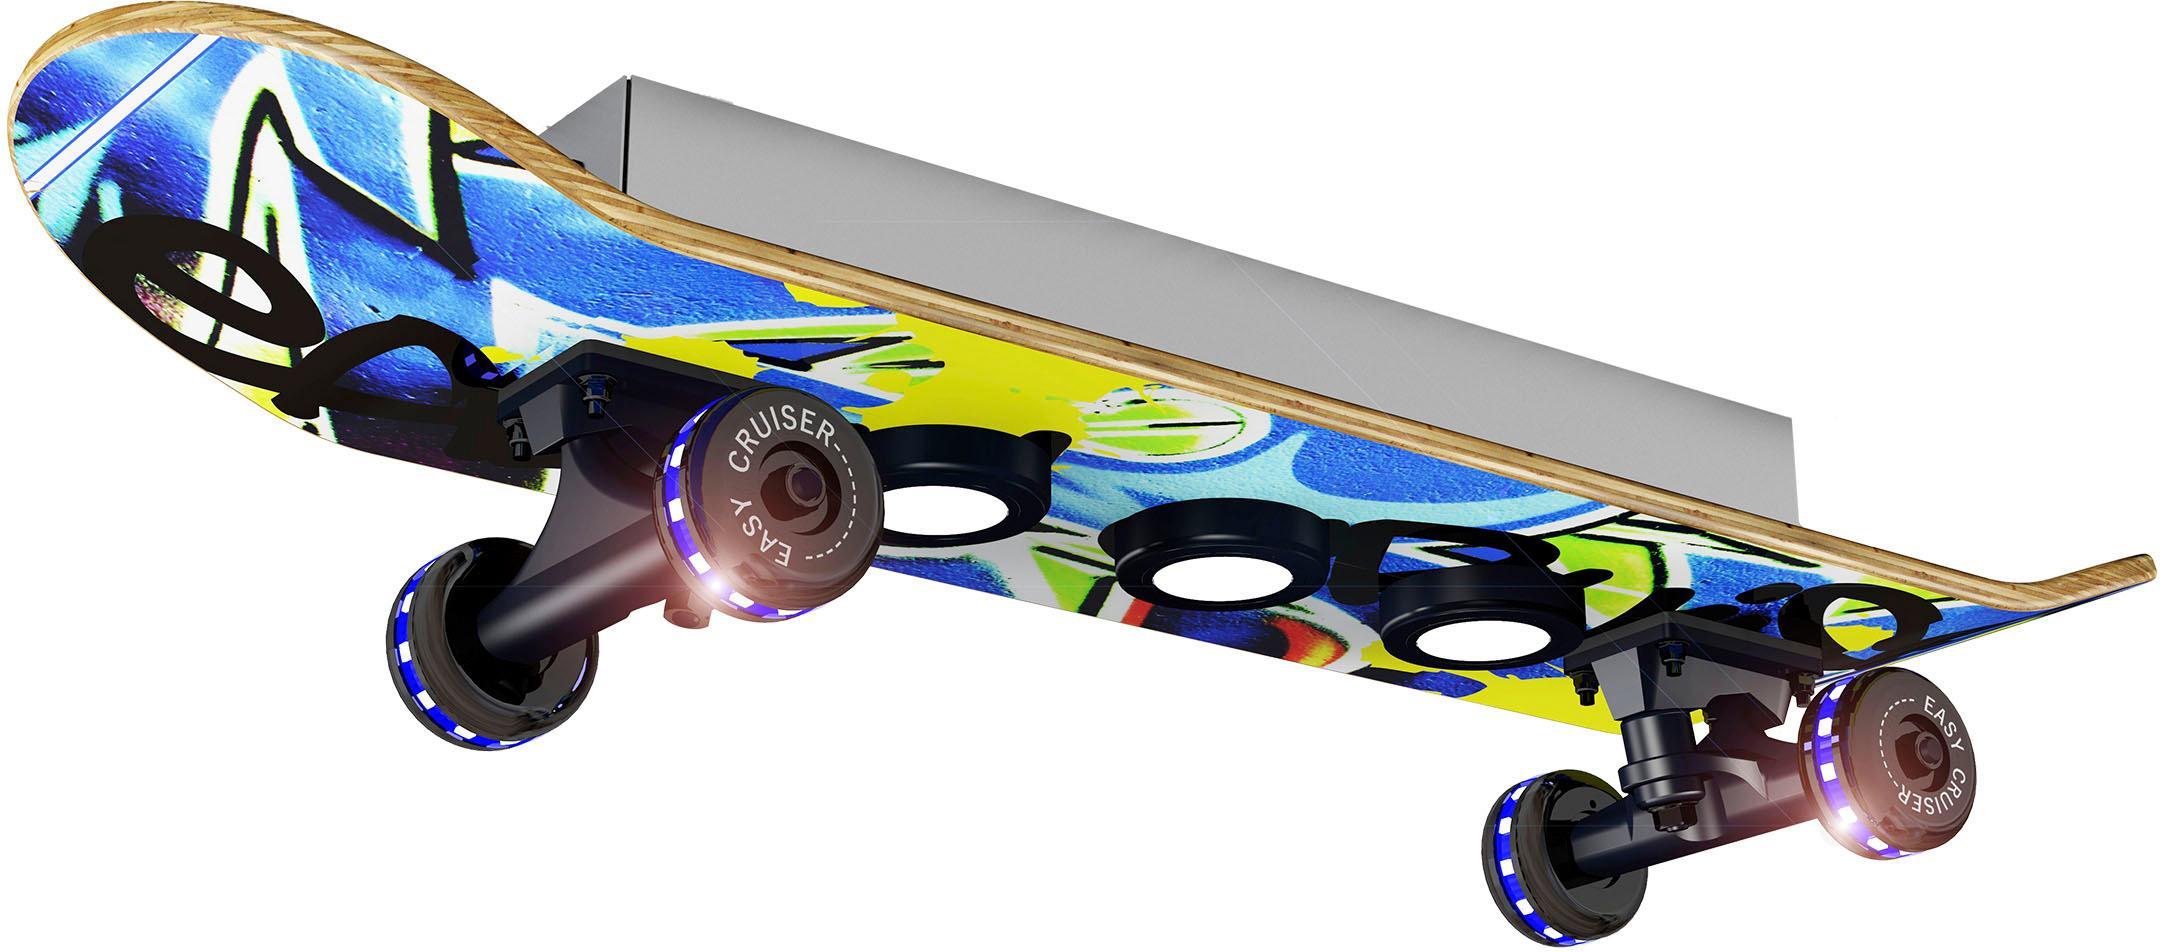 EVOTEC LED Deckenleuchte EASY CRUISER GRAFFITI, LED-Board, Warmweiß, LED Deckenlampe